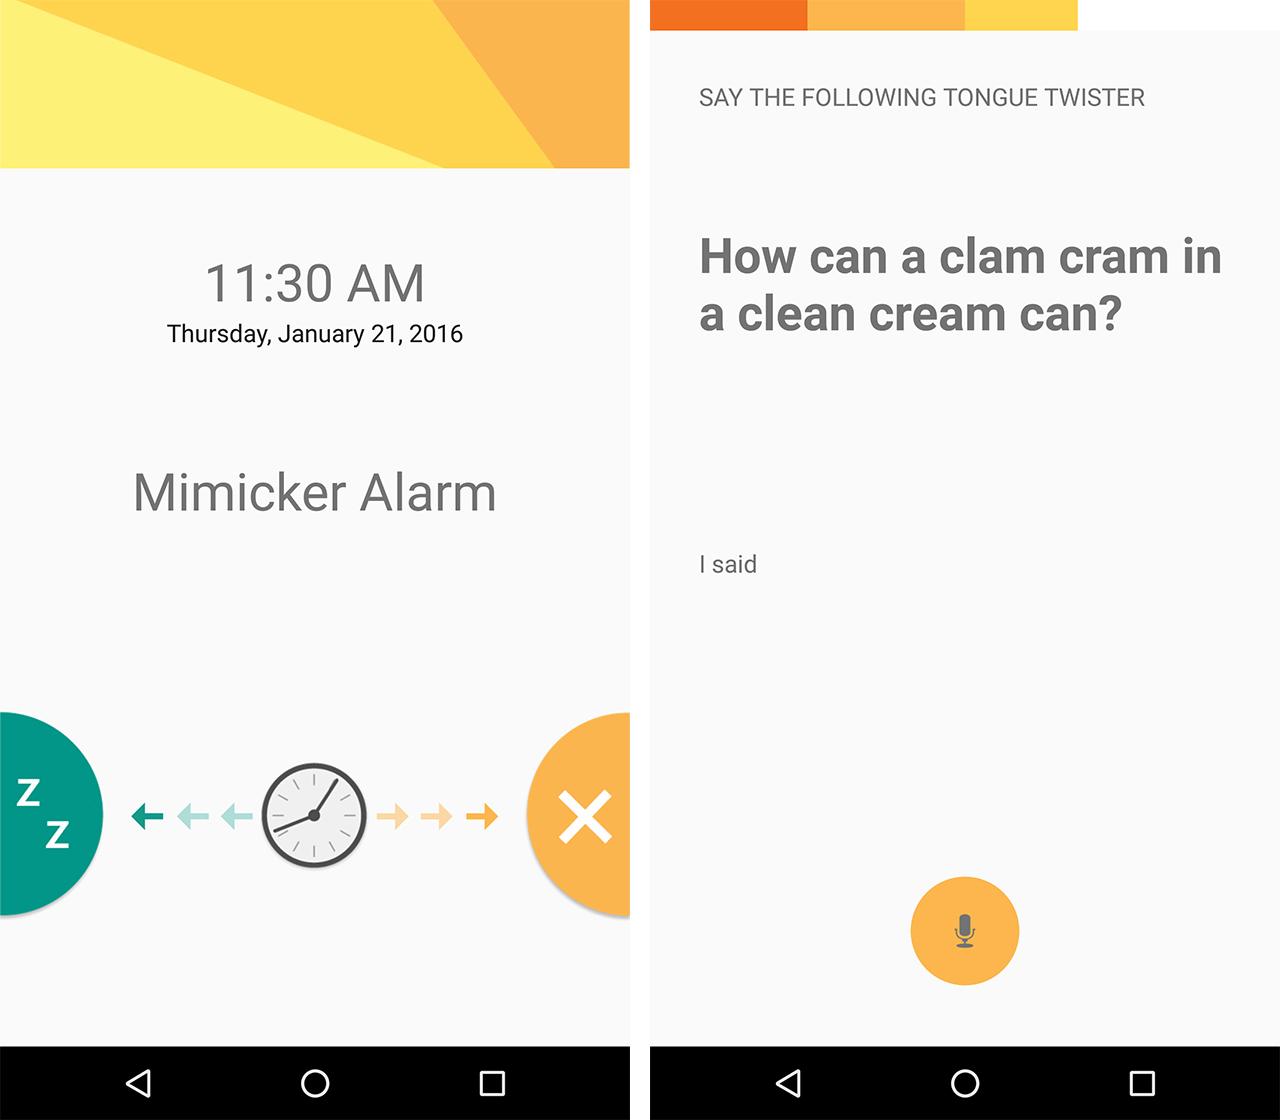 Mimicker Alarm